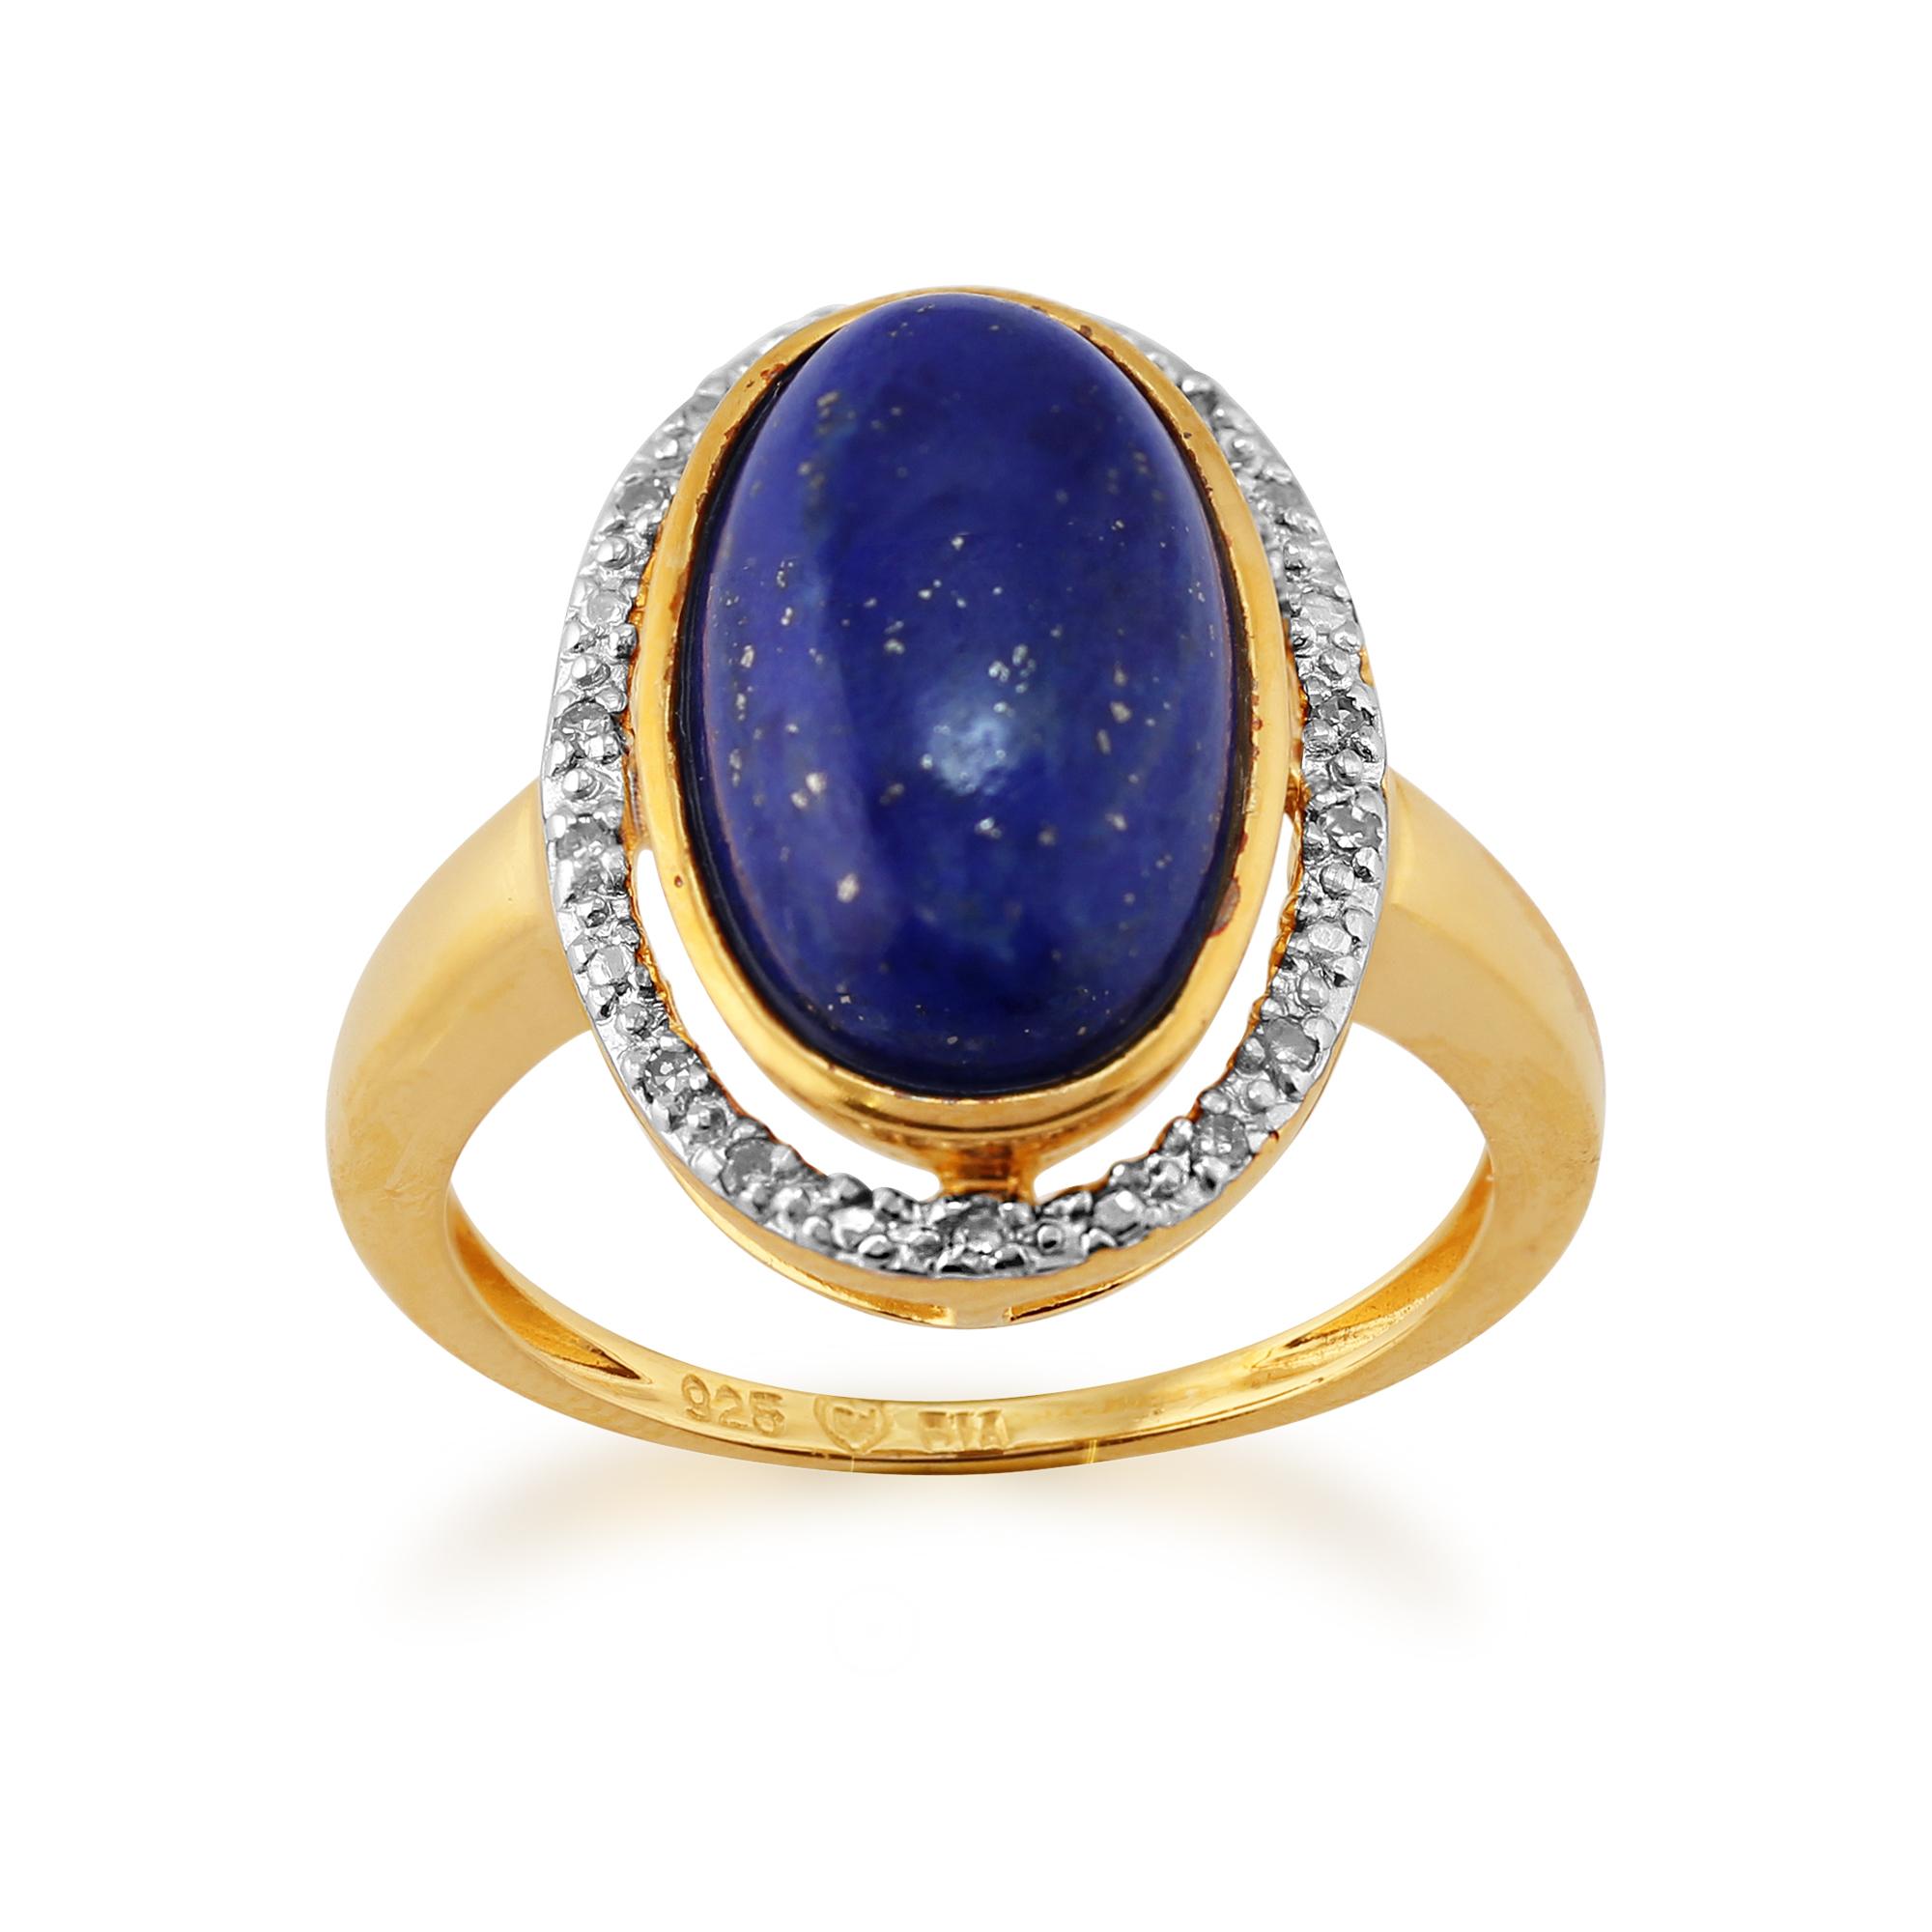 gemondo gold plated sterling silver genuine lapis lazuli diamond cluster ring ebay. Black Bedroom Furniture Sets. Home Design Ideas